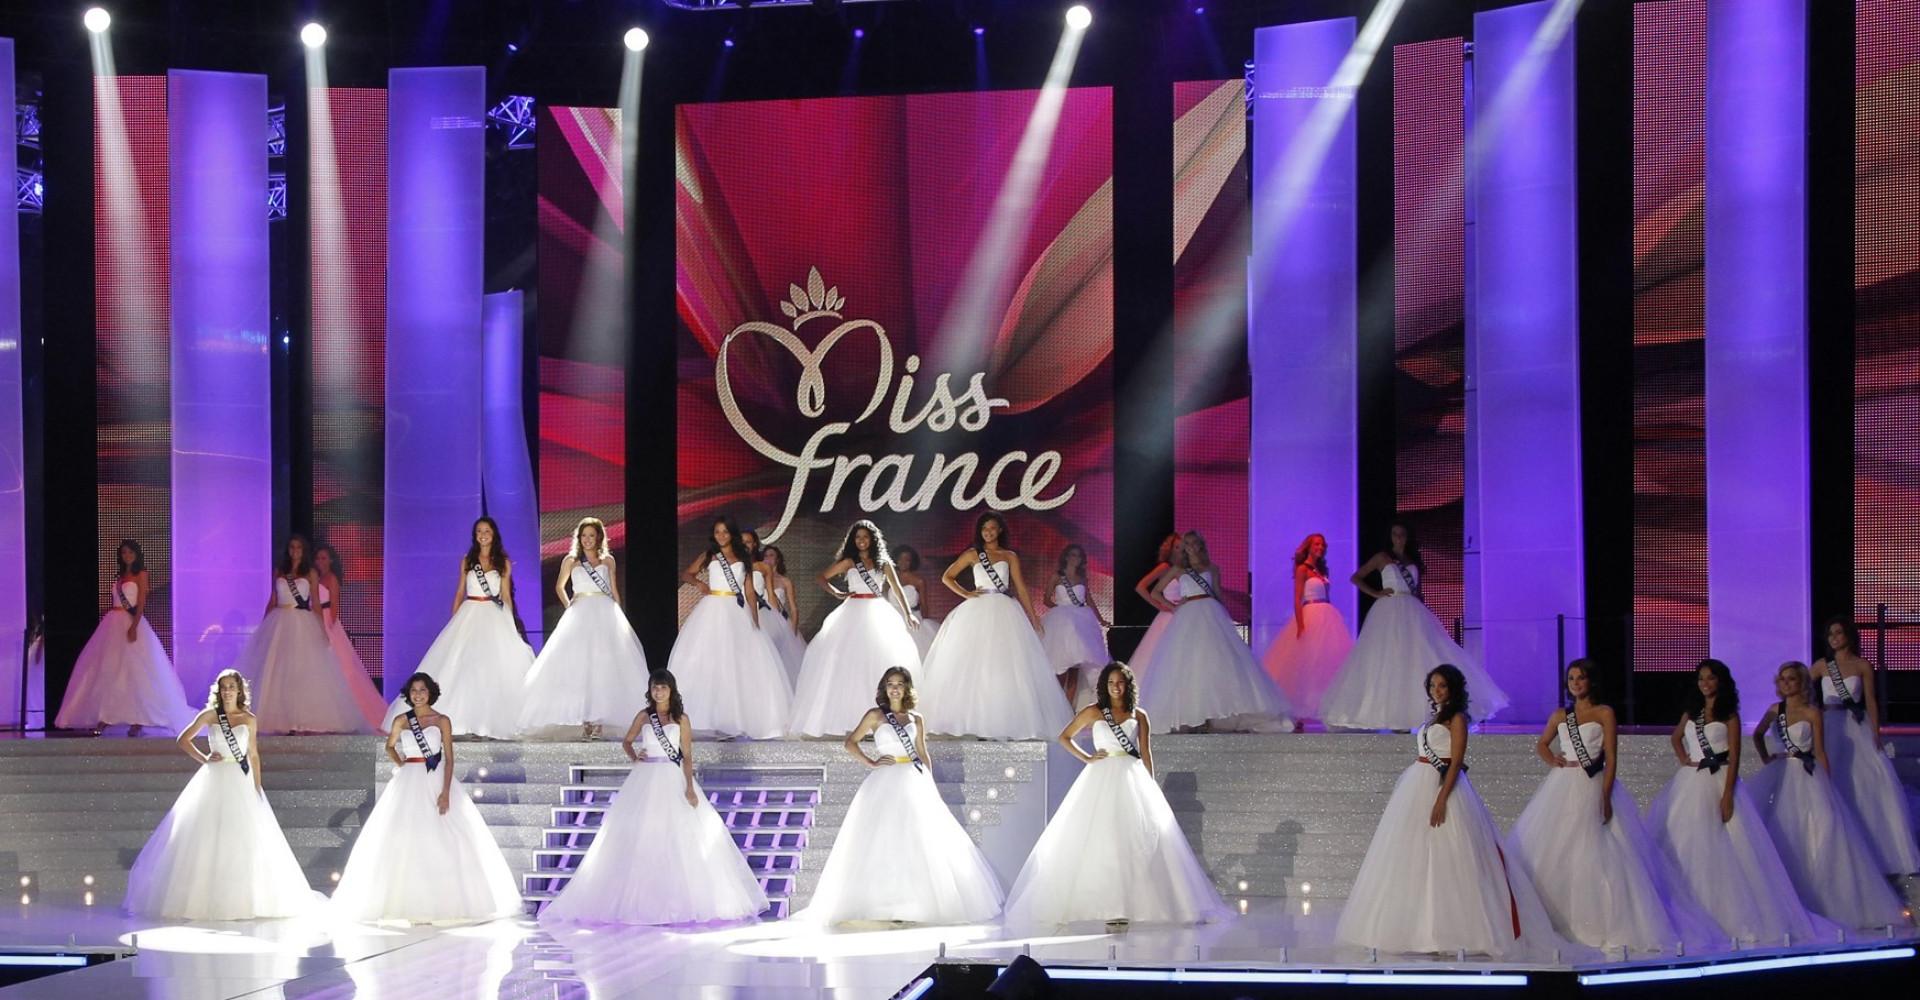 Miss France 2019: on connaît la présidente du jury!